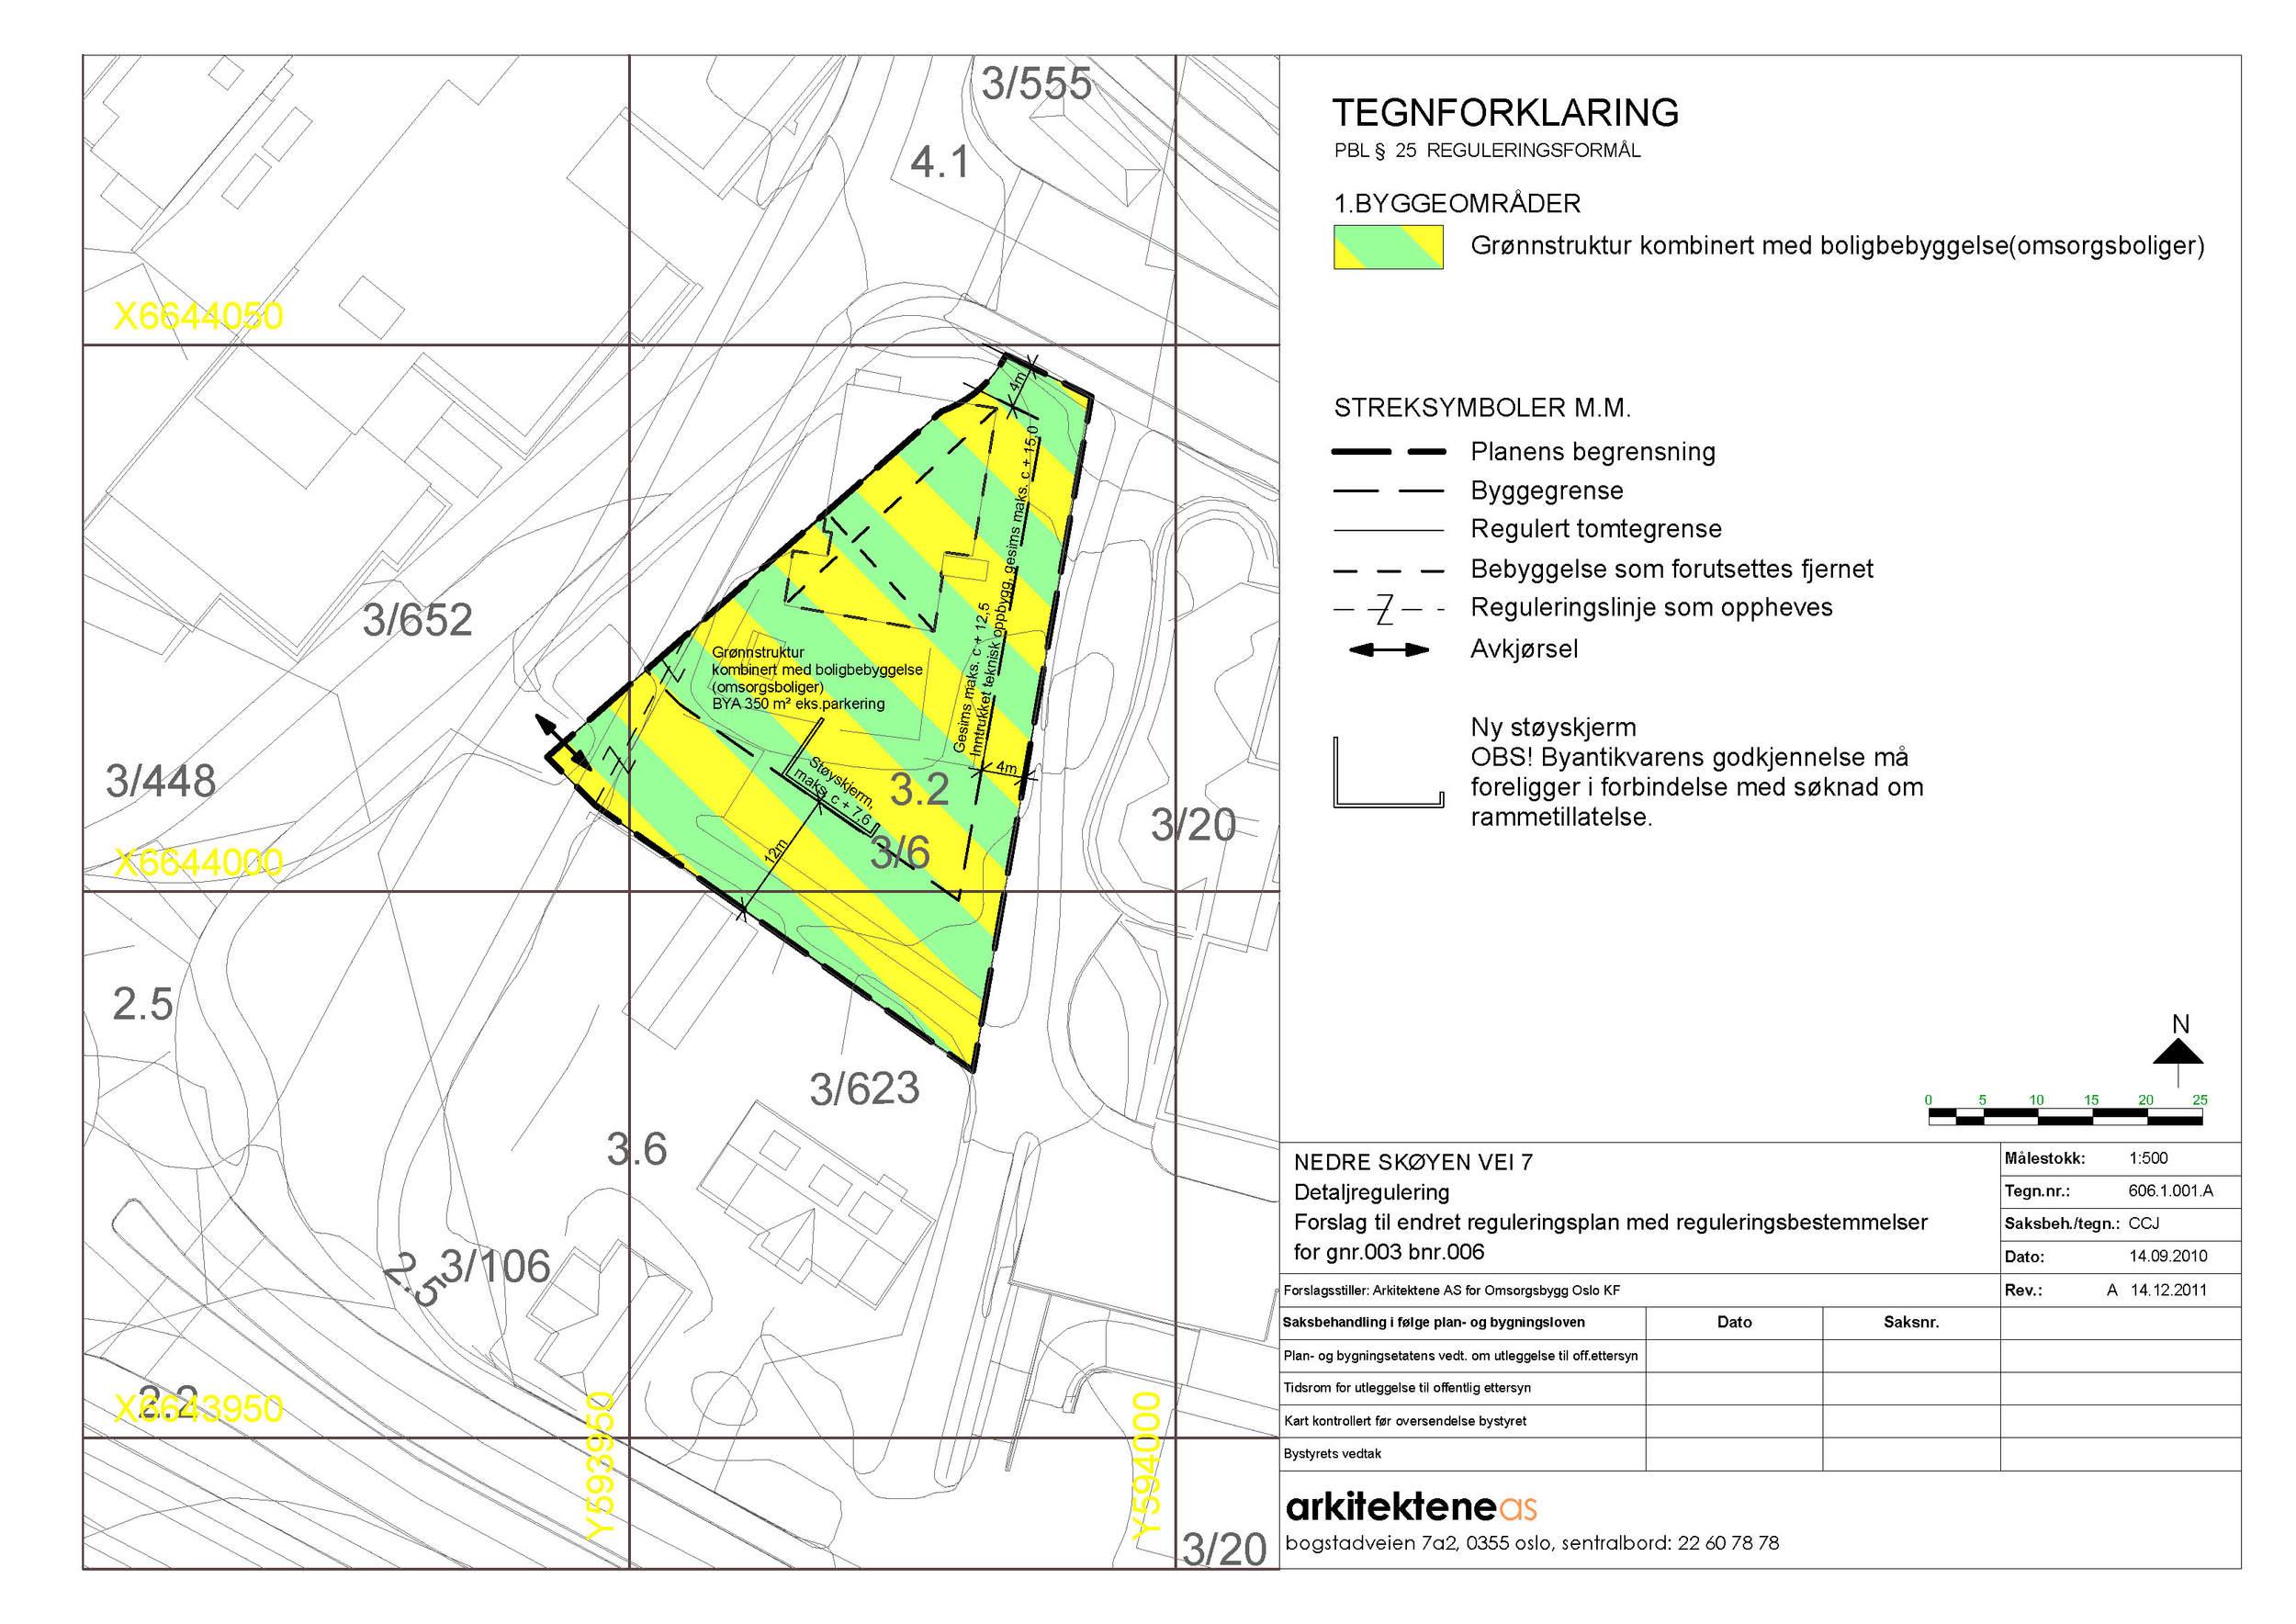 606-1-001-A Reguleringsplan.jpg